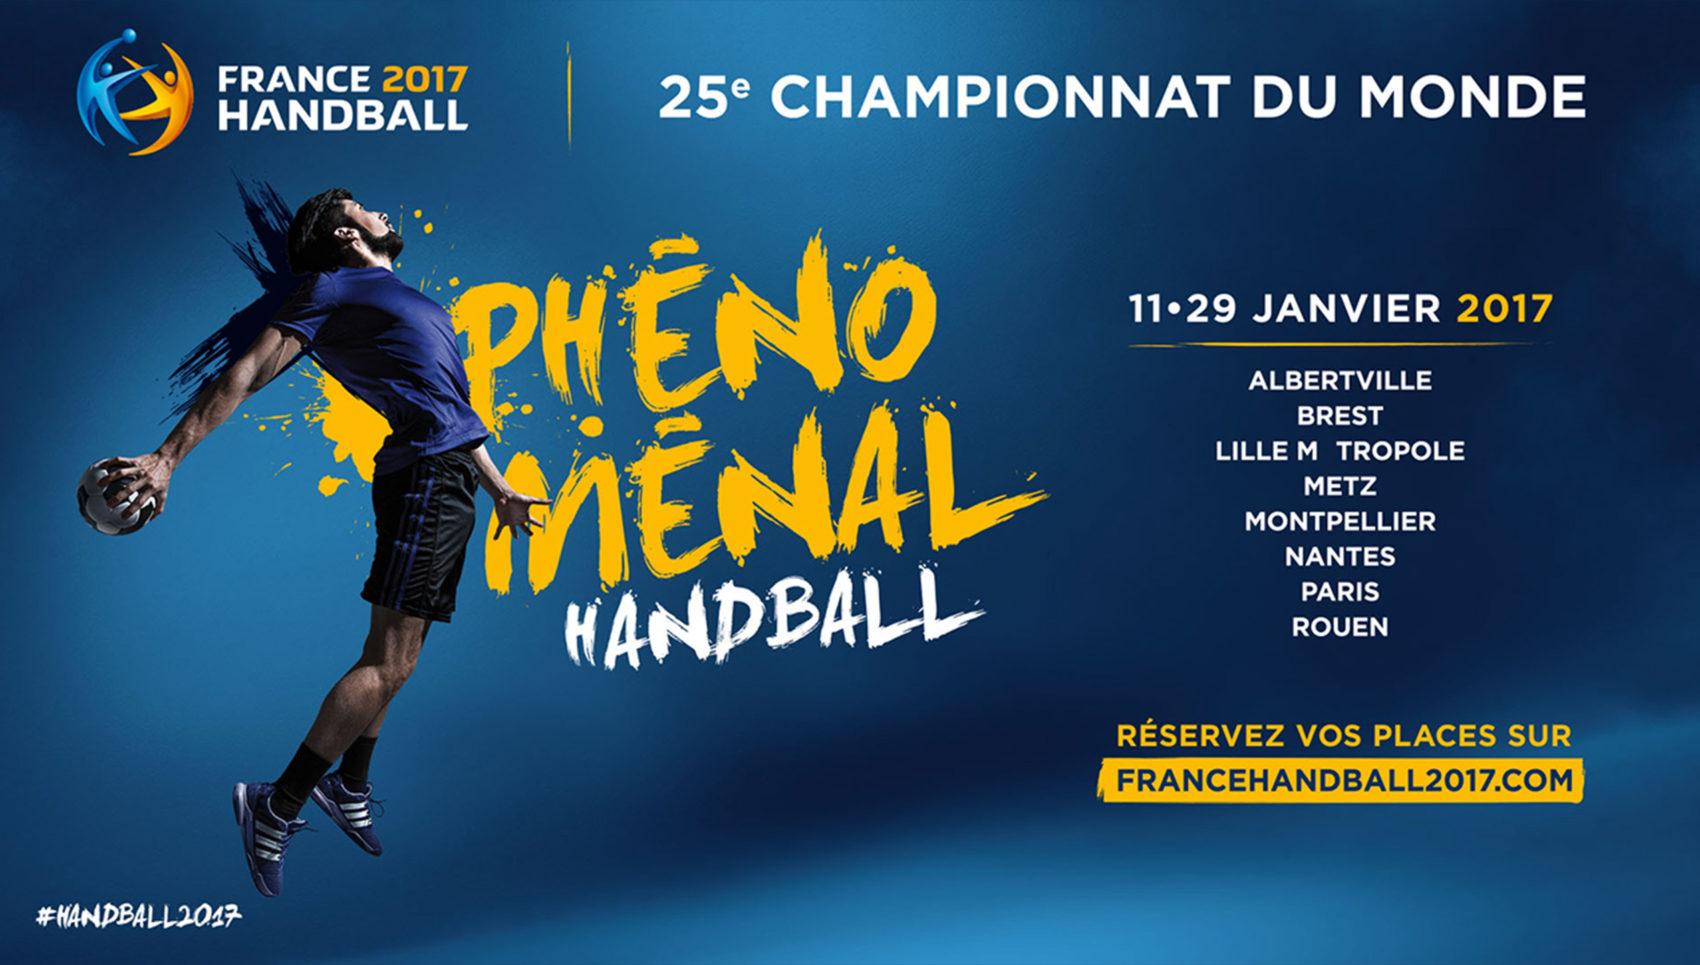 France_Handball_2017_key_visual_affiche